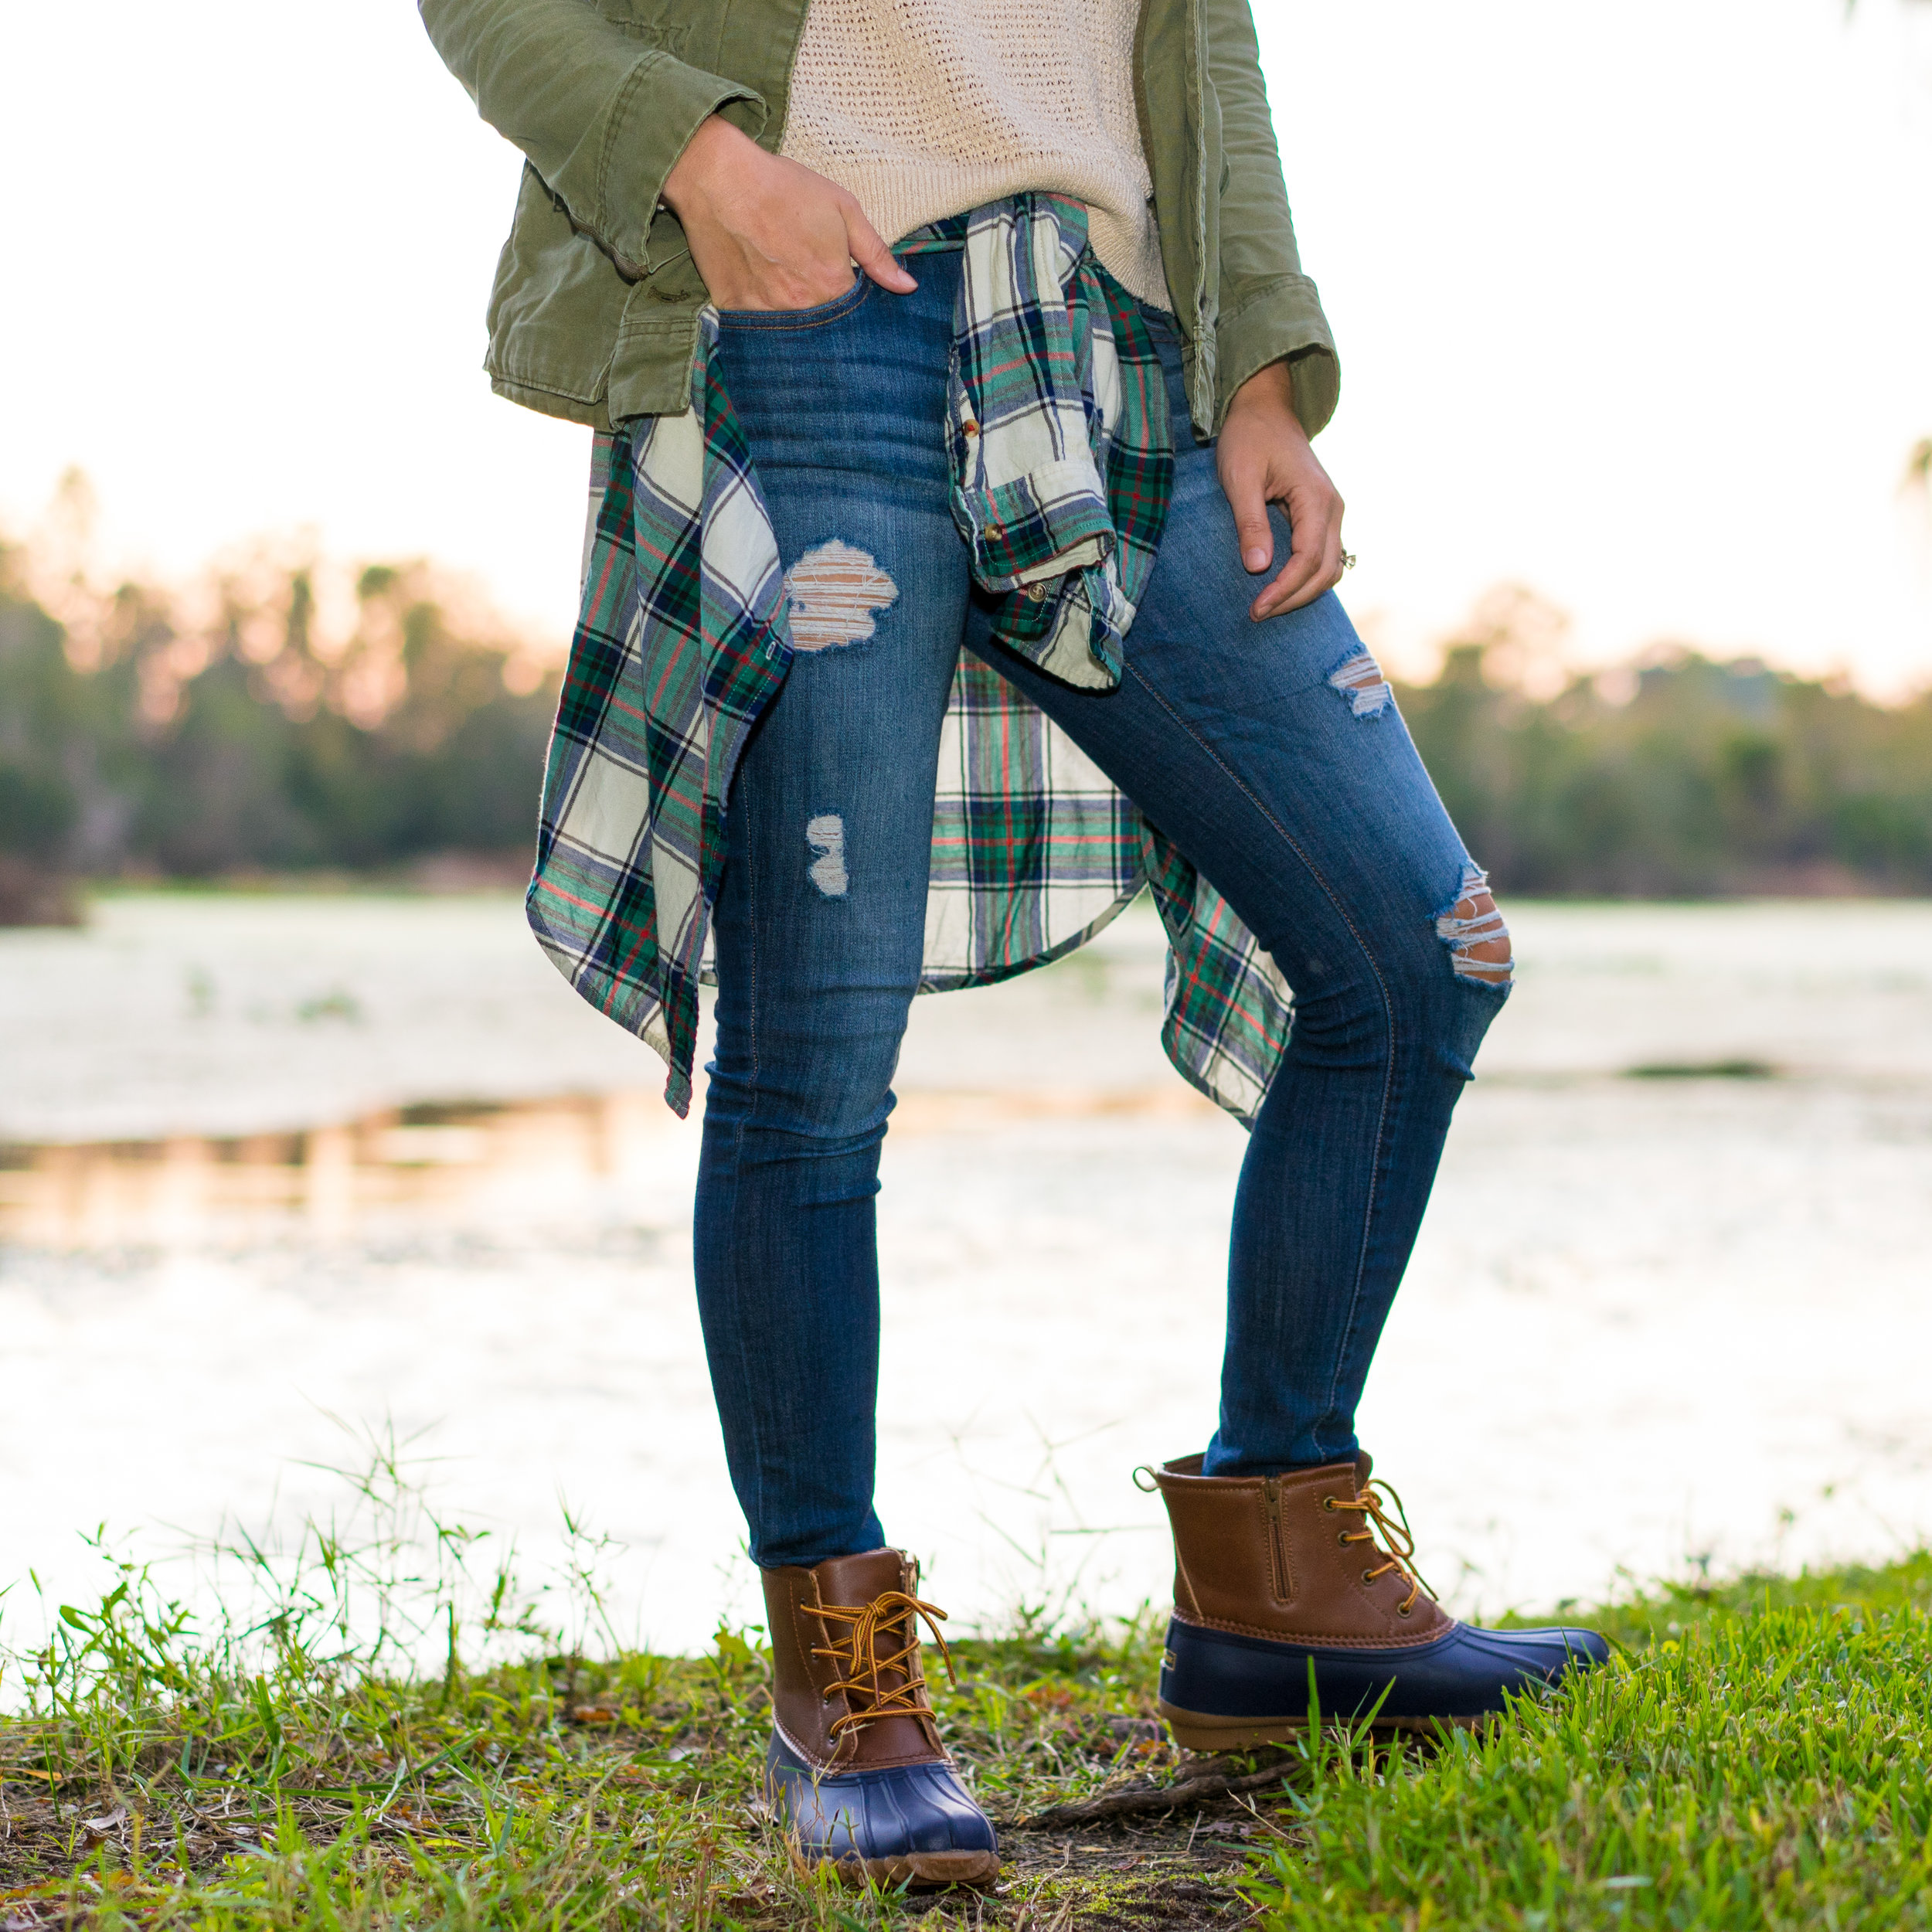 Utility jacket, plaid shirt, duck boots